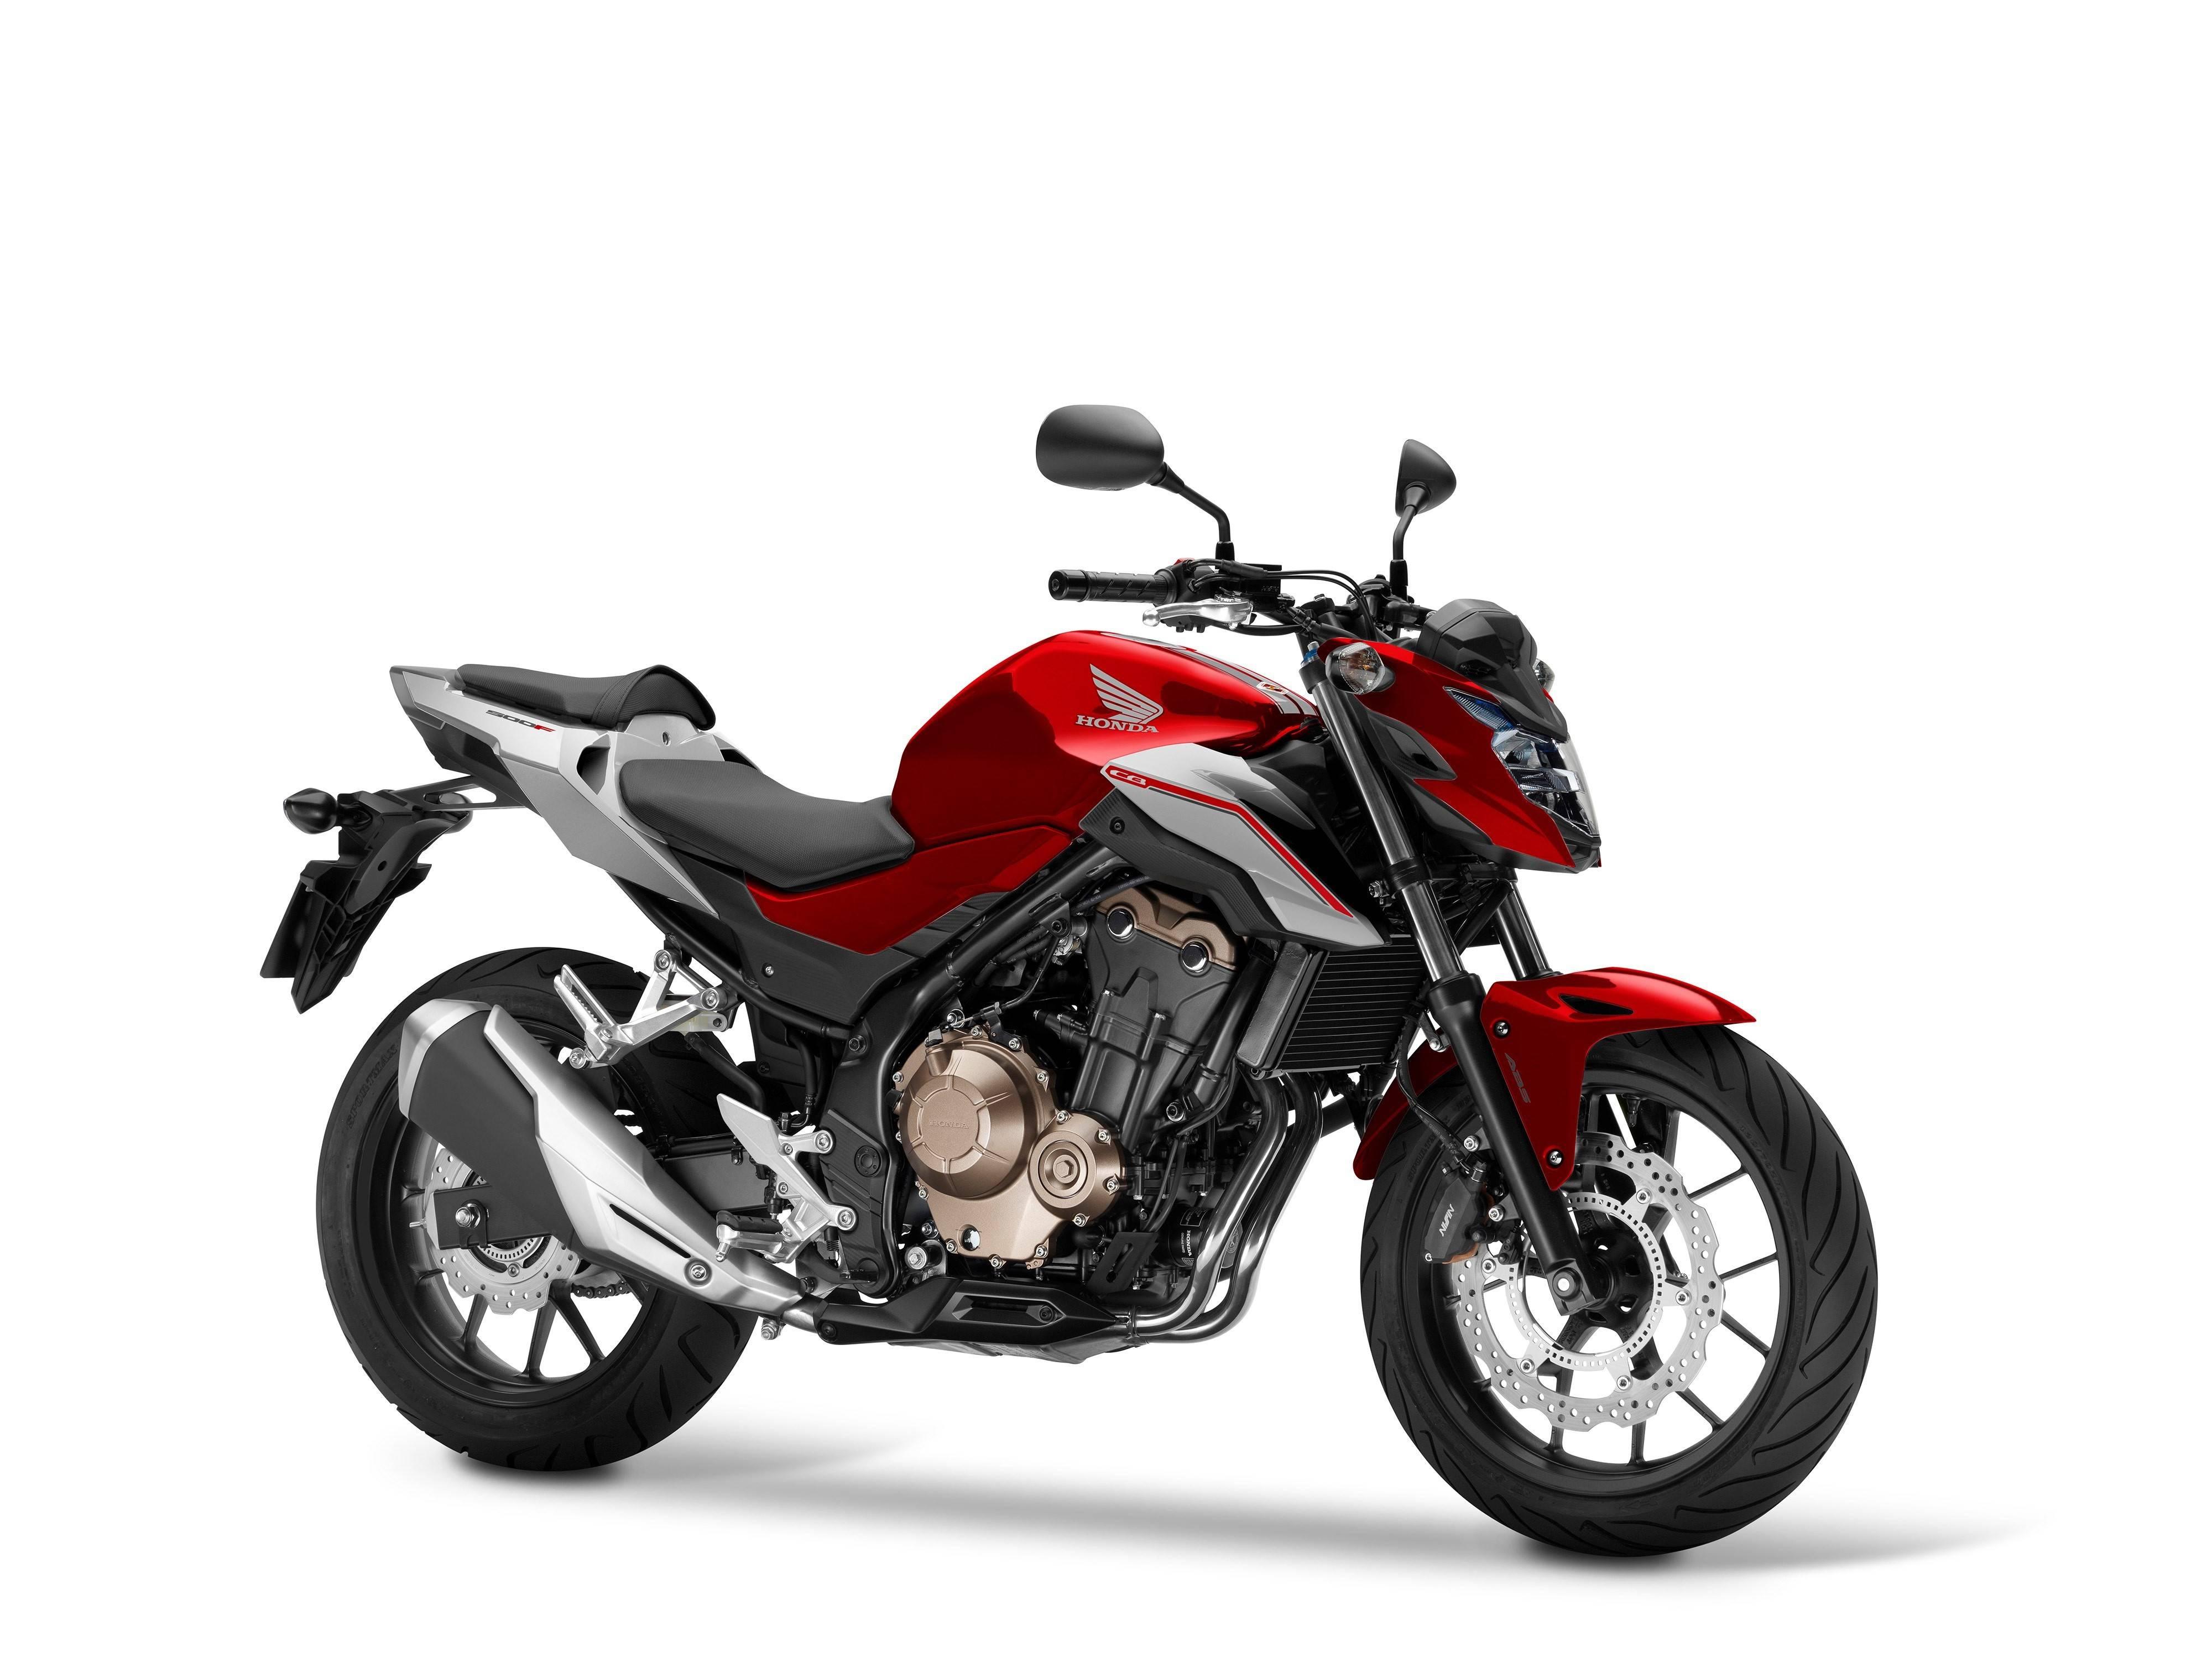 Honda-Motorcycle-BigBike-มอเตอร์ไซค์-ฮอนด้า-บิ๊กไบค์-ข่าวผลิตภัณฑ์-20180703-honda-bigbike-500-series